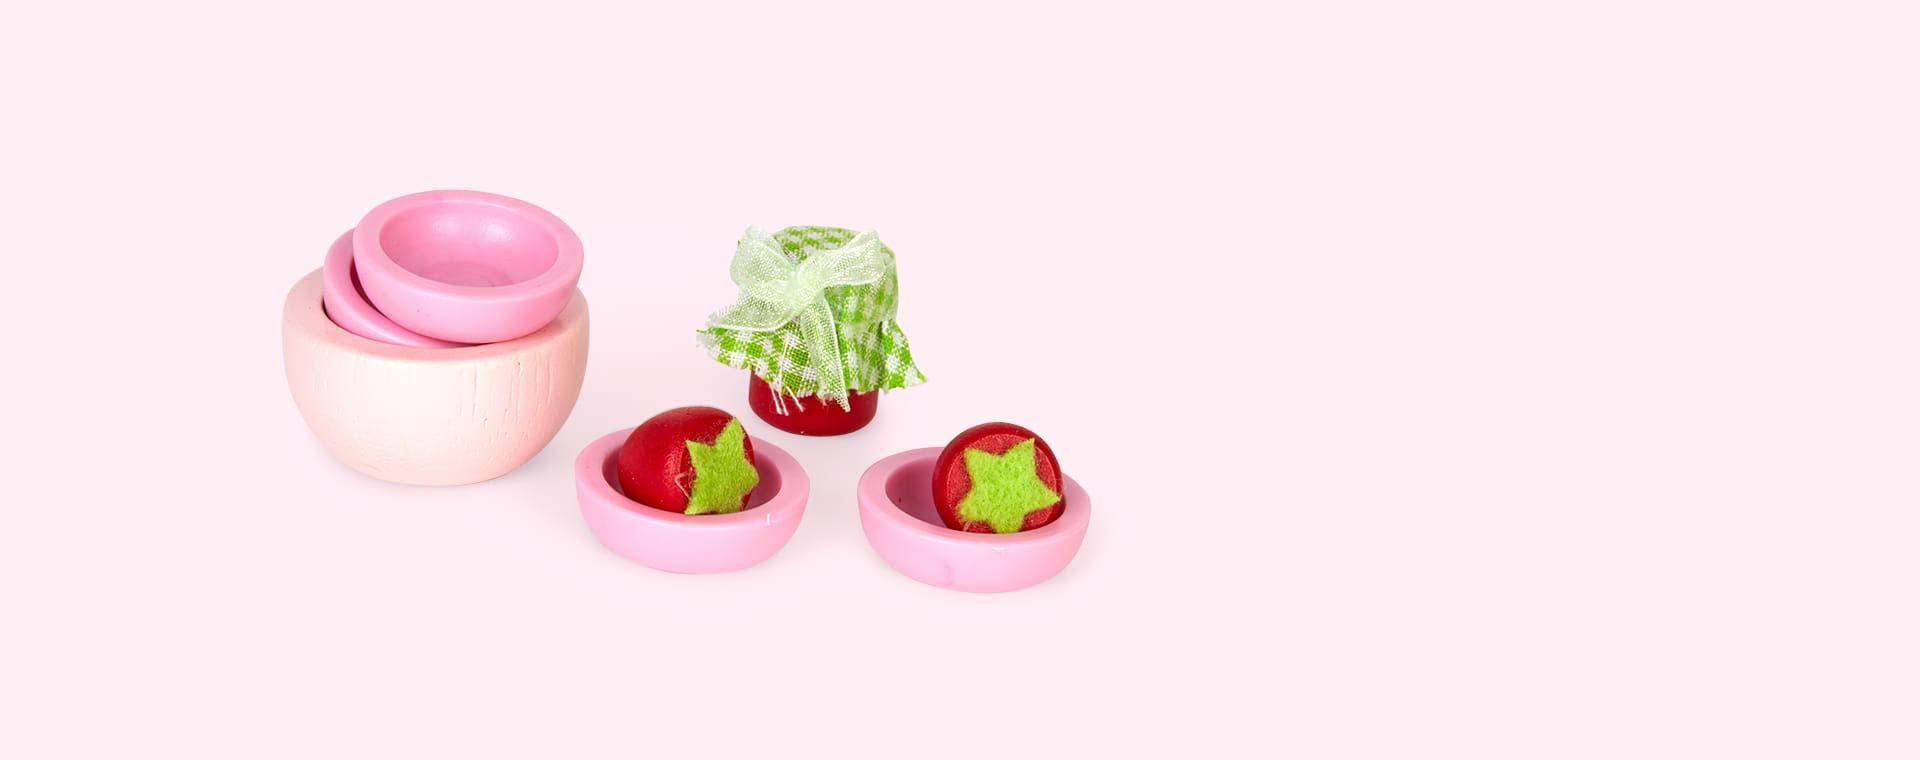 Make & Bake Le Toy Van Make & Bake Accessory Pack